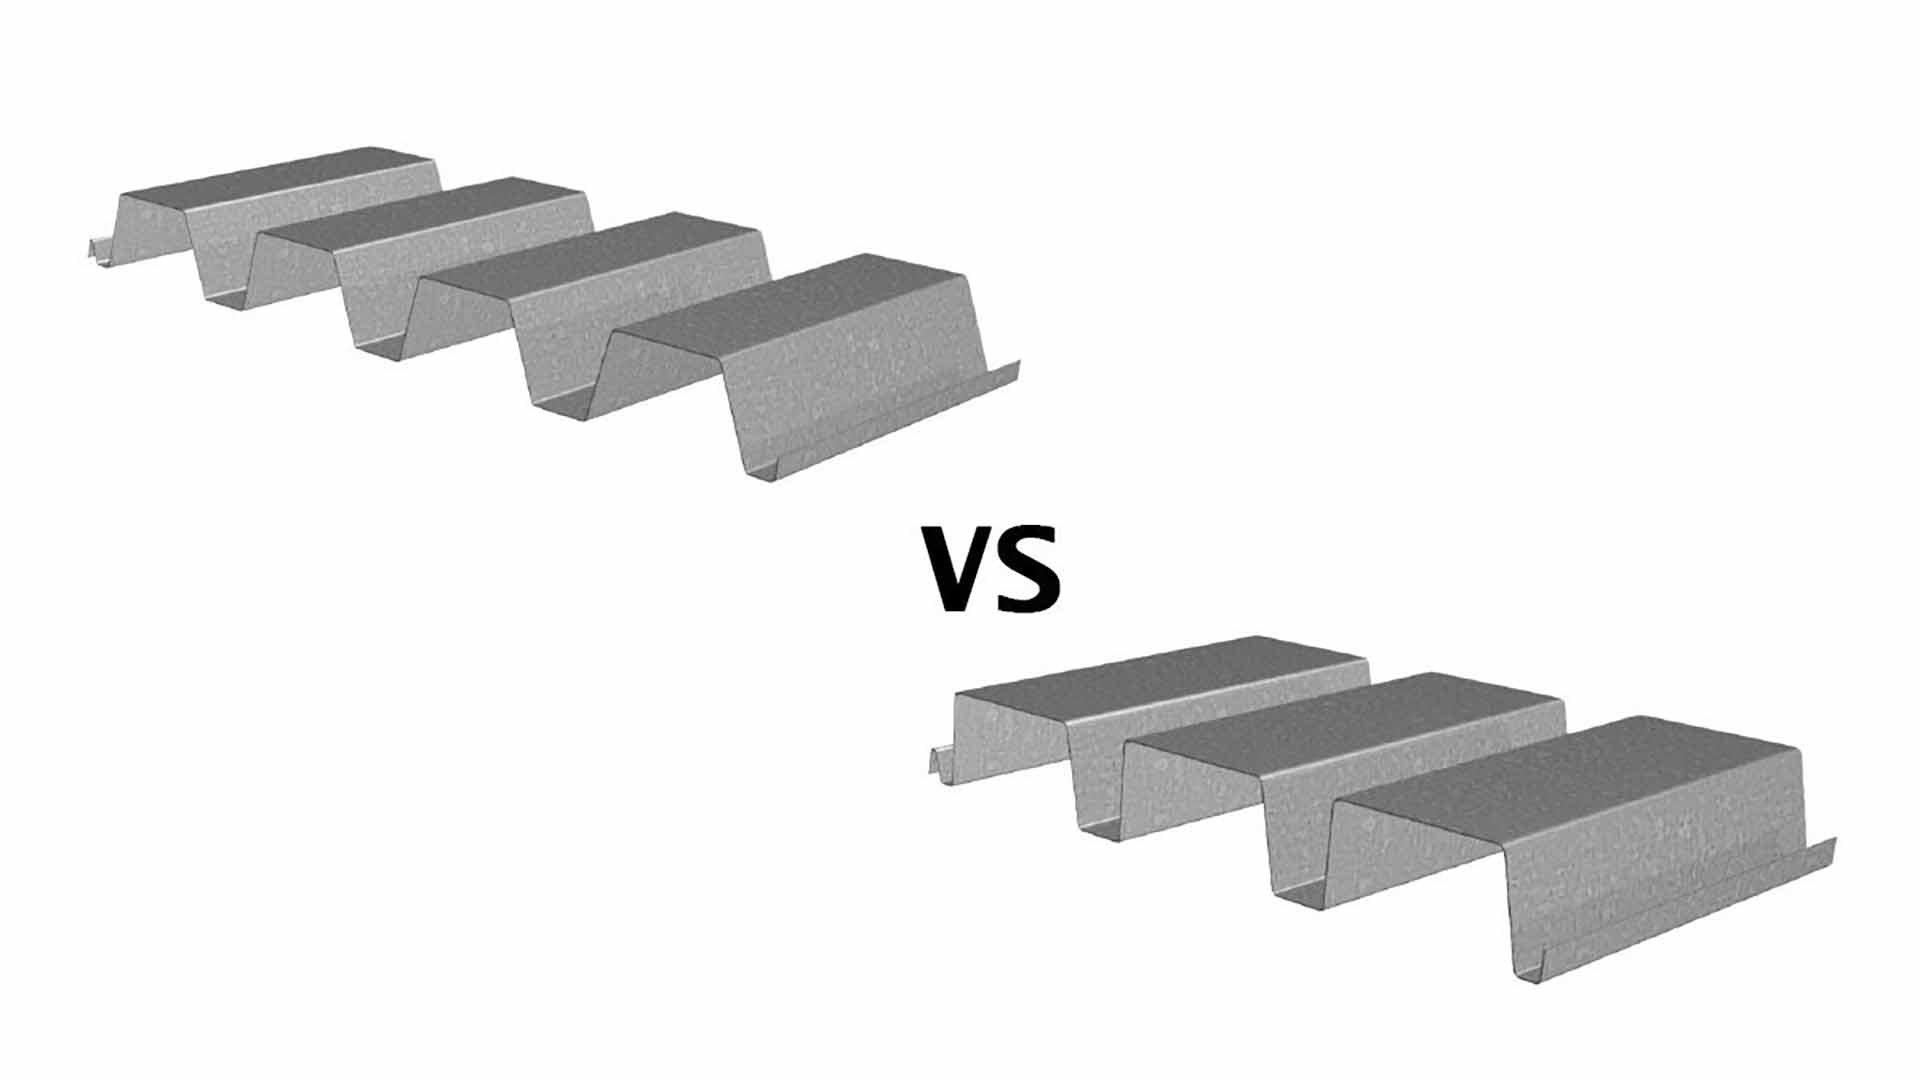 hsn3-metal-roof-deck-1